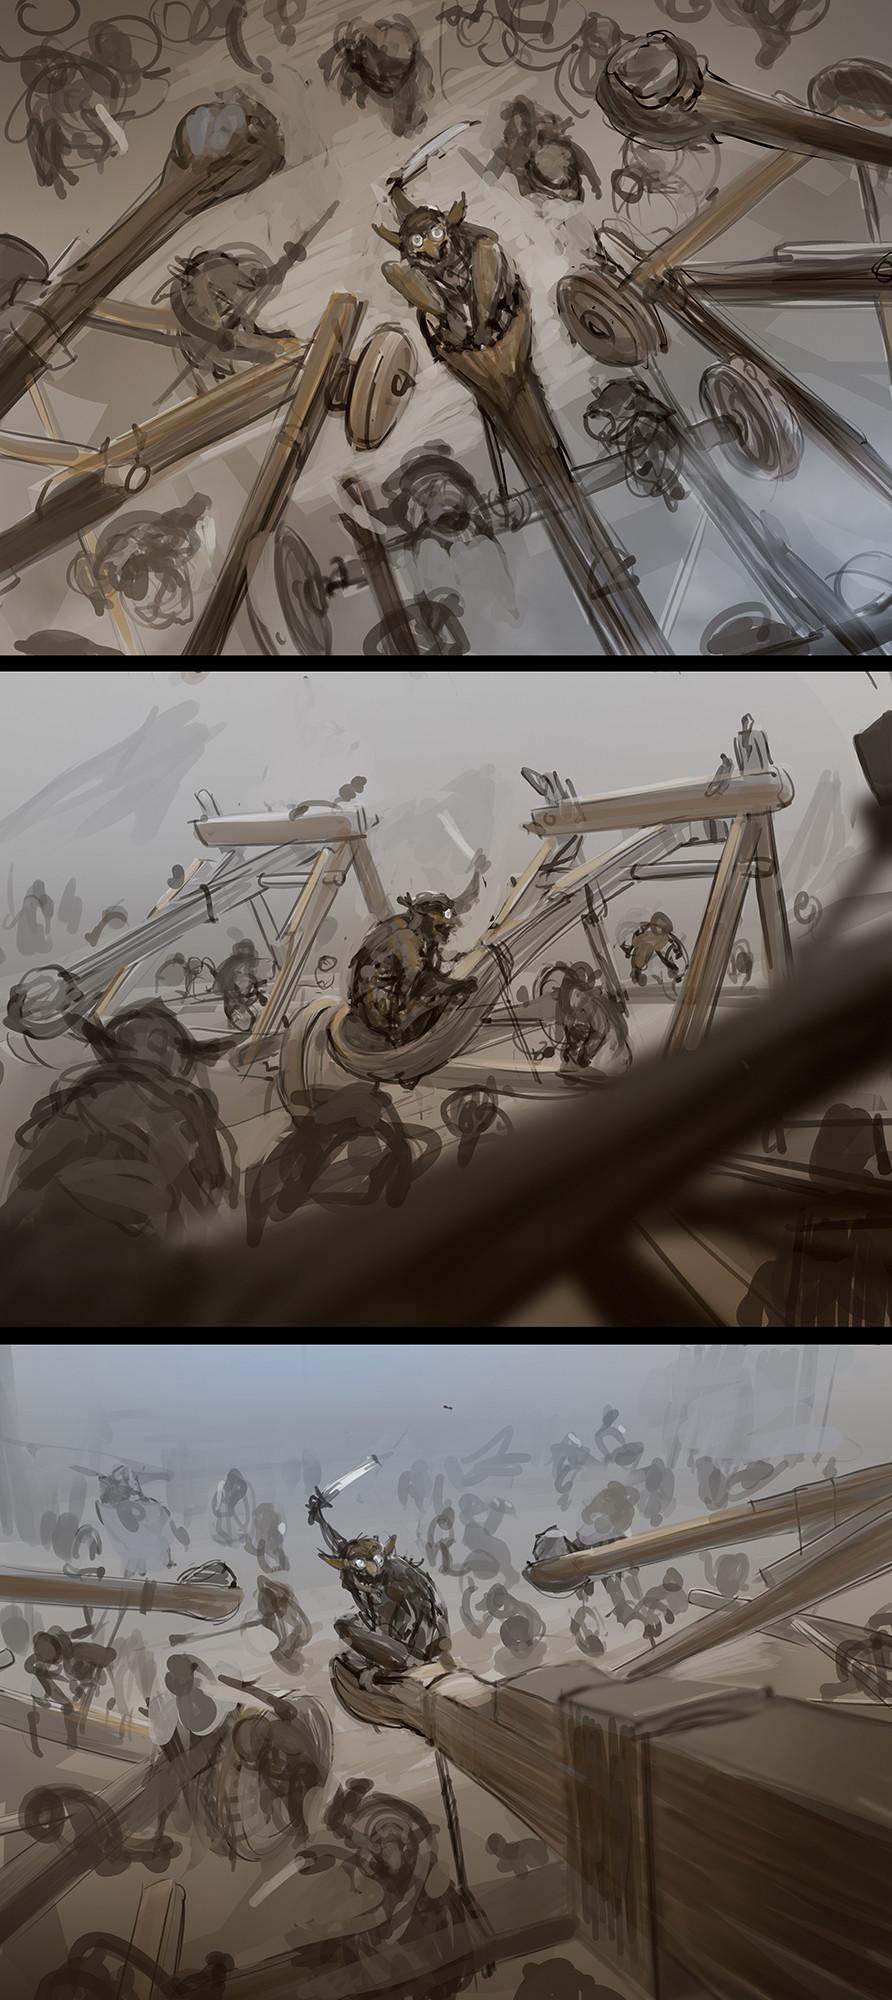 Bram sels wotc goblin barrage bram sels sketches